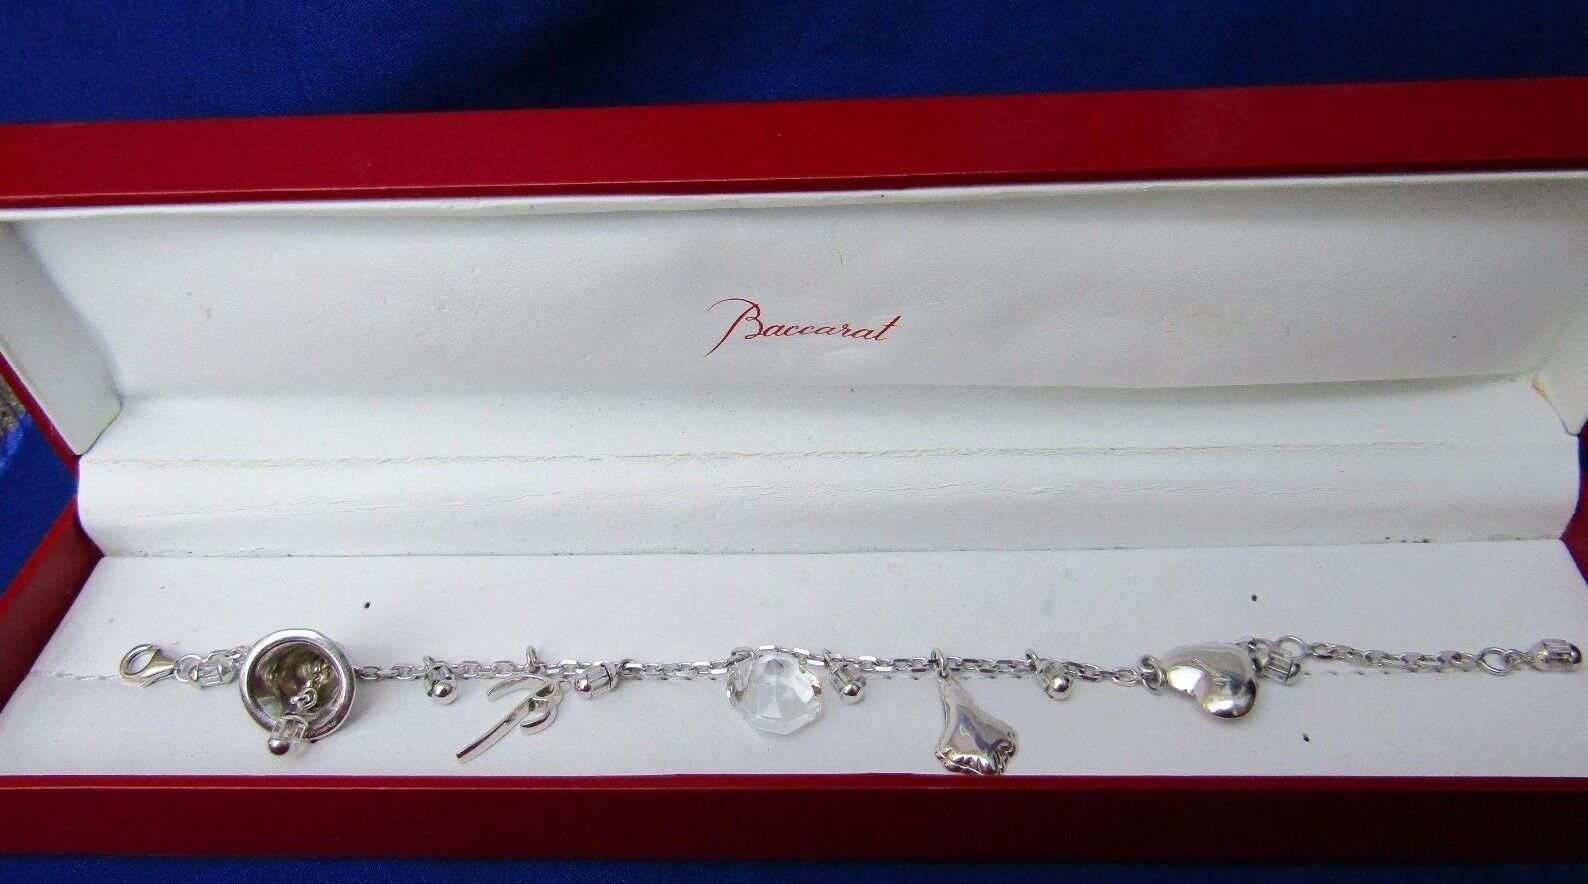 argentoo argentoo argentoo Sterling Cristallo Baccarat sentito Multi Ciondolo Braccialetto Design SCATOLA ORIGINALE f1608d